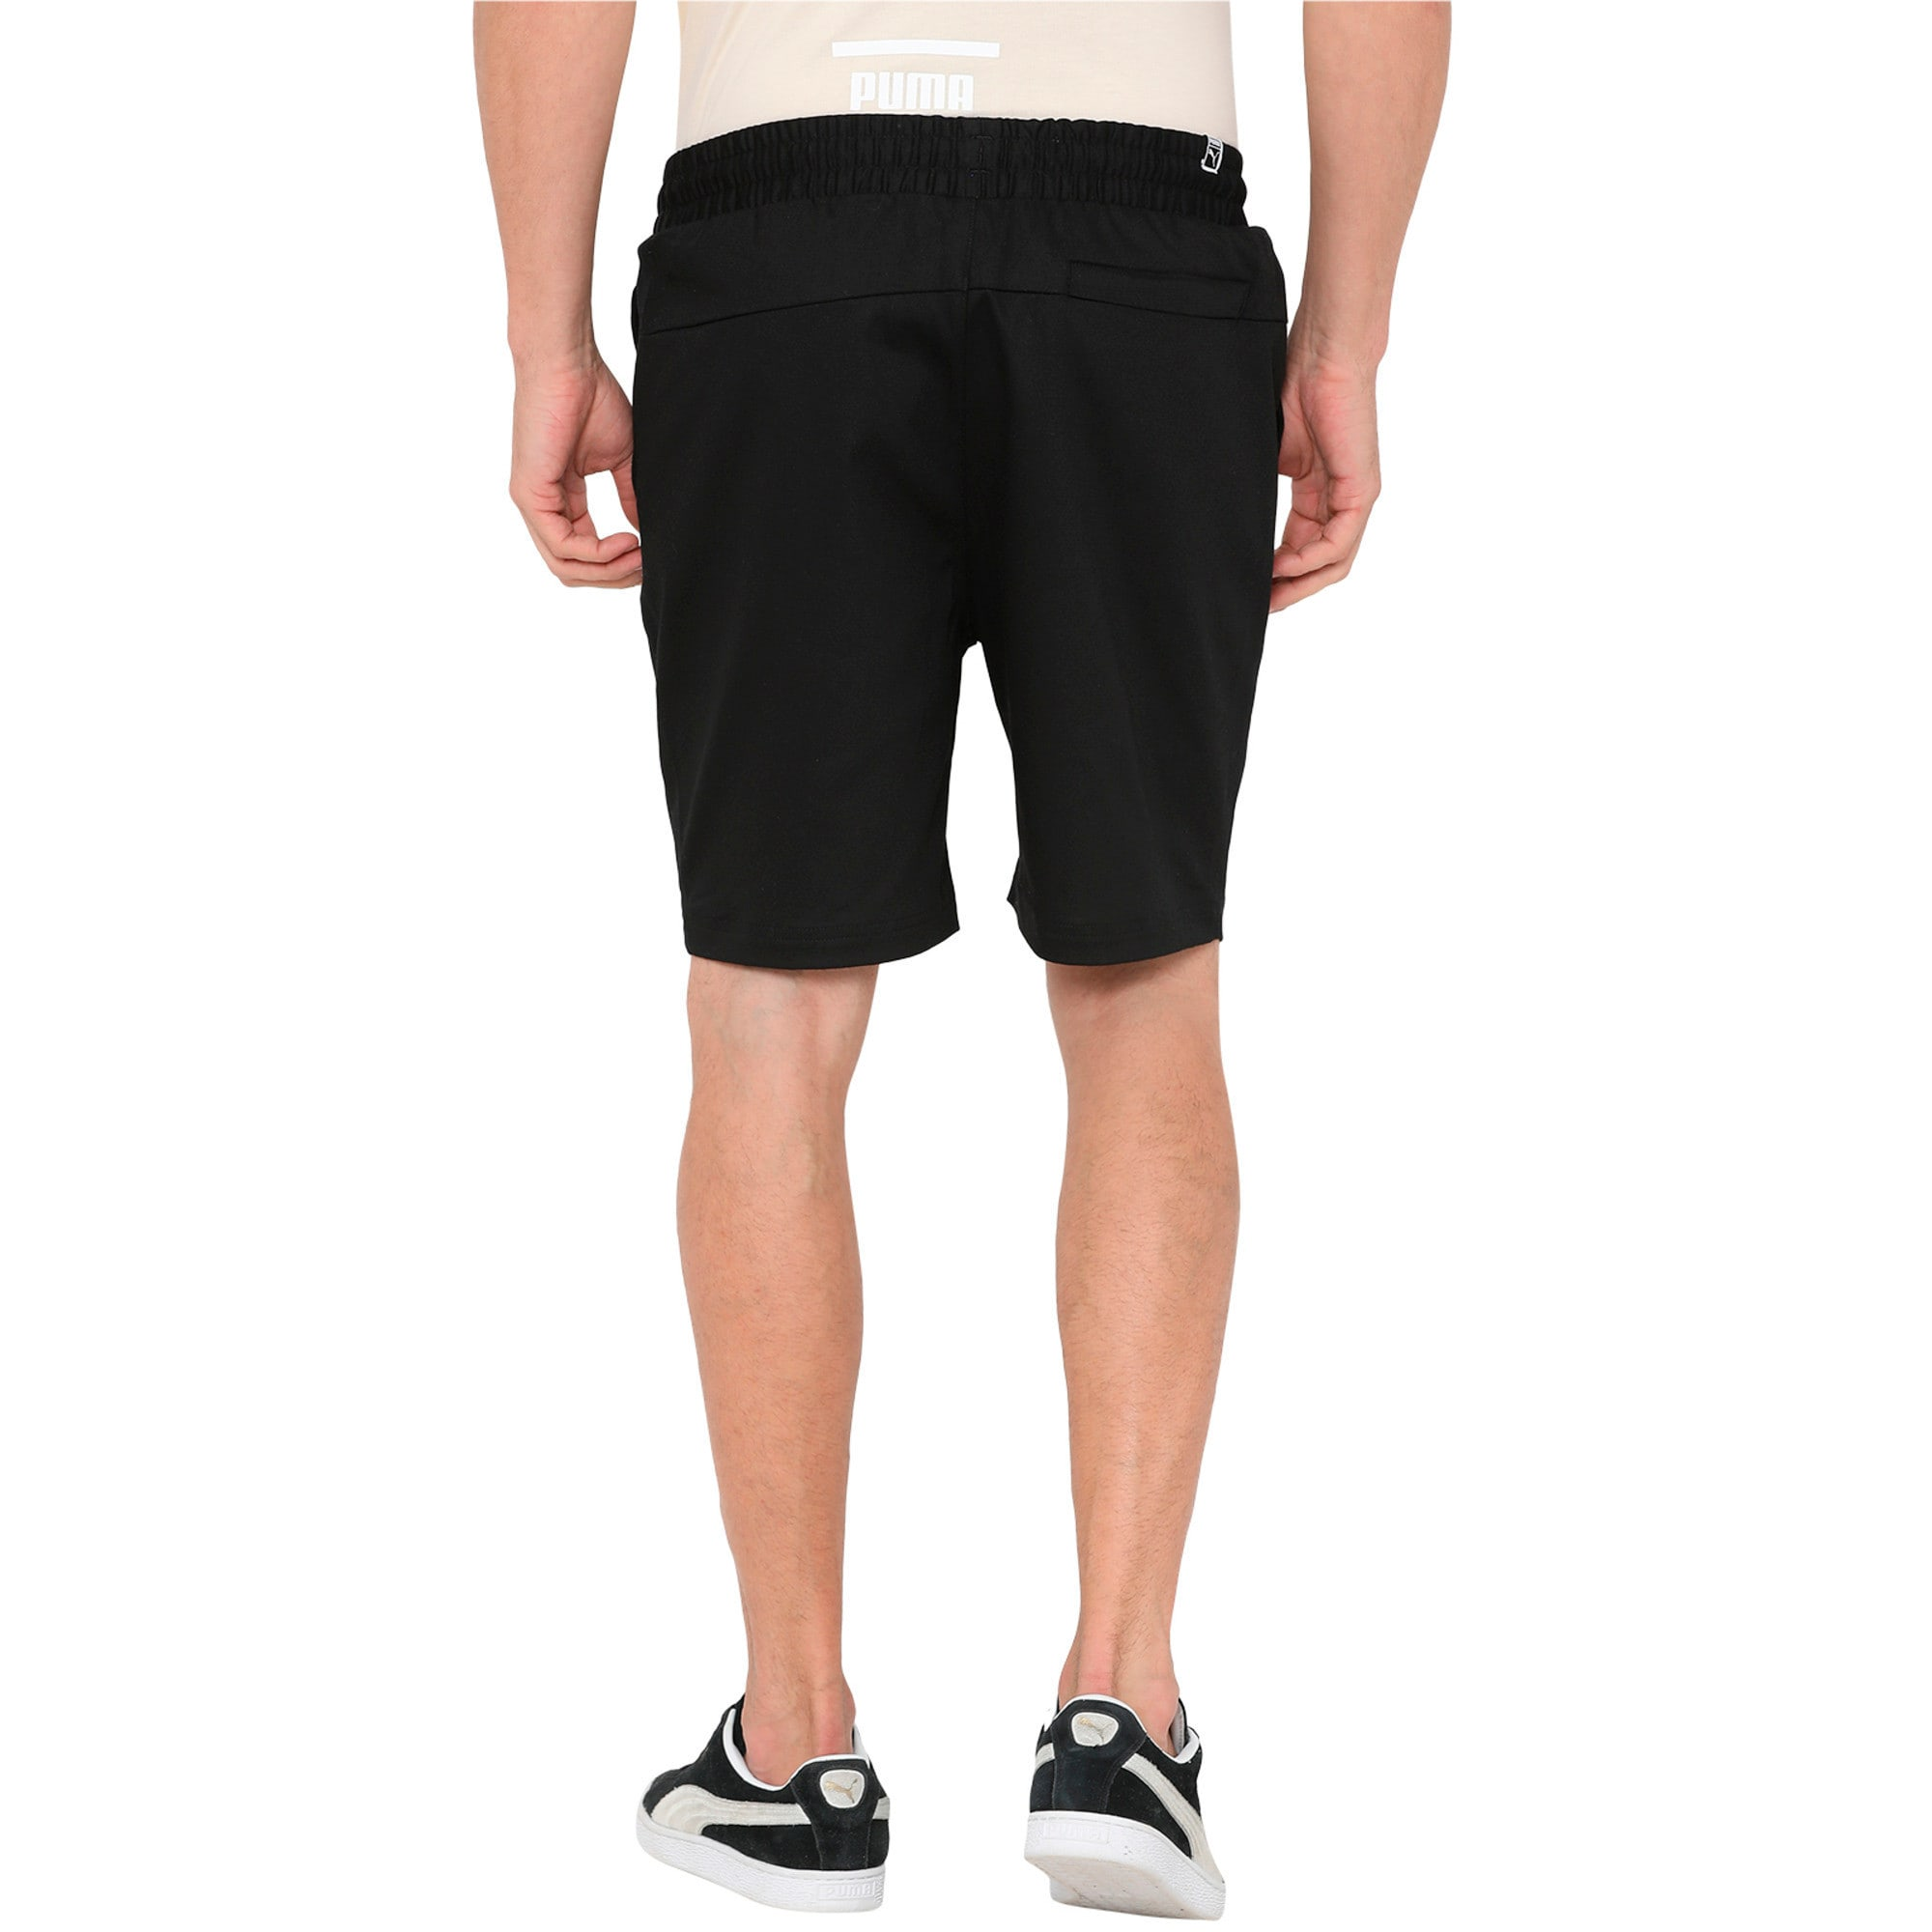 Thumbnail 3 of Men's Suede Shorts, Puma Black, medium-IND